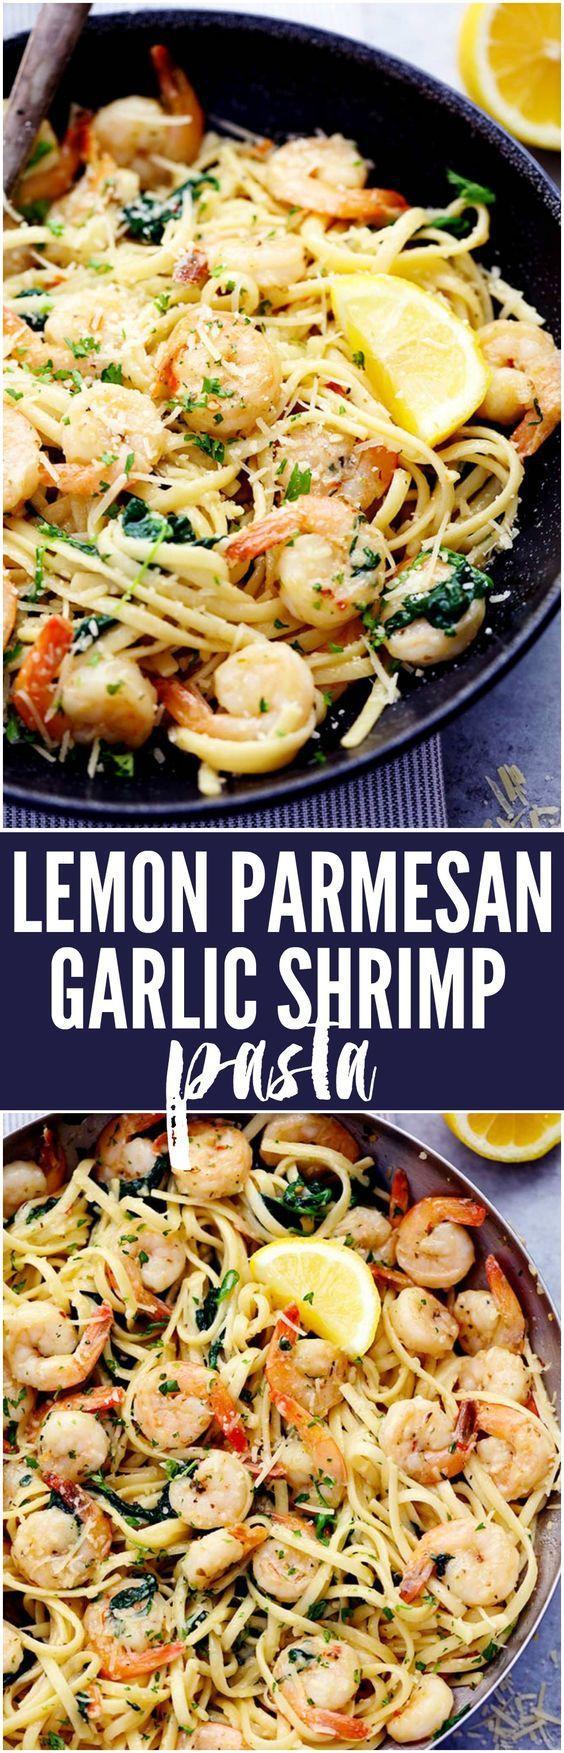 One Pot Lemon Garlic Parmesan Shrimp Pasta Recipe | The Recipe Critic - The Best Easy One Pot Pasta Family Dinner Recipes